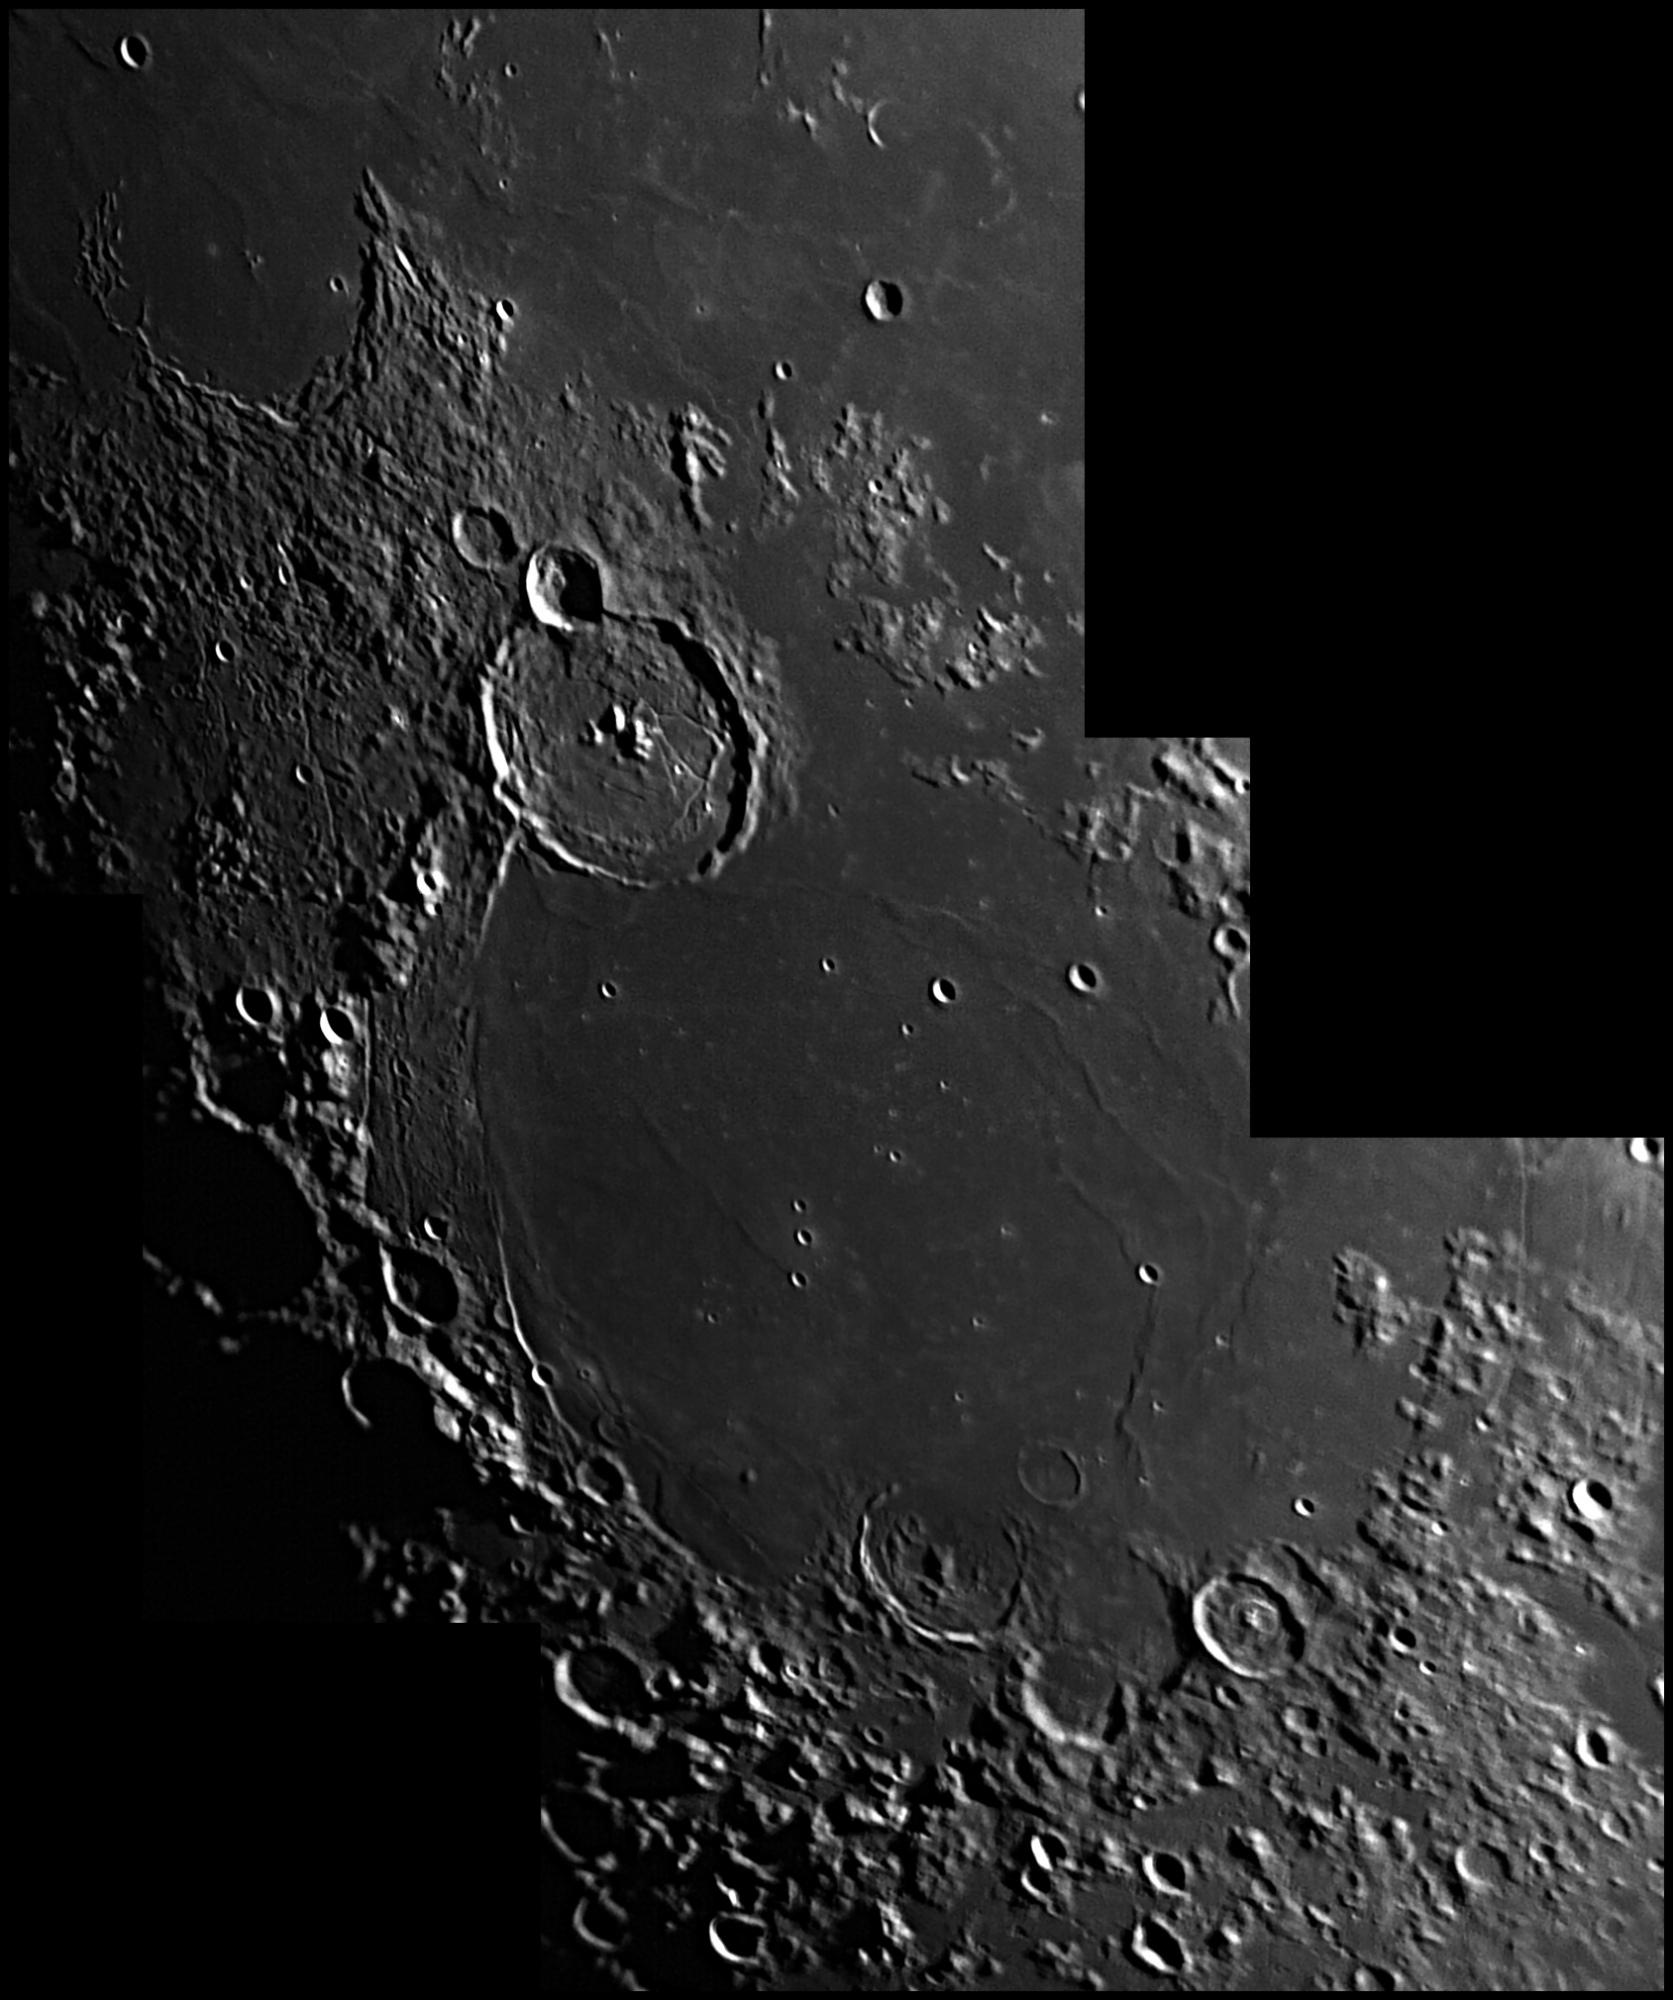 lune_2020_04_04_212157_213410.thumb.jpg.2ce2851a0c373d79d1654c36d98704e6.jpg